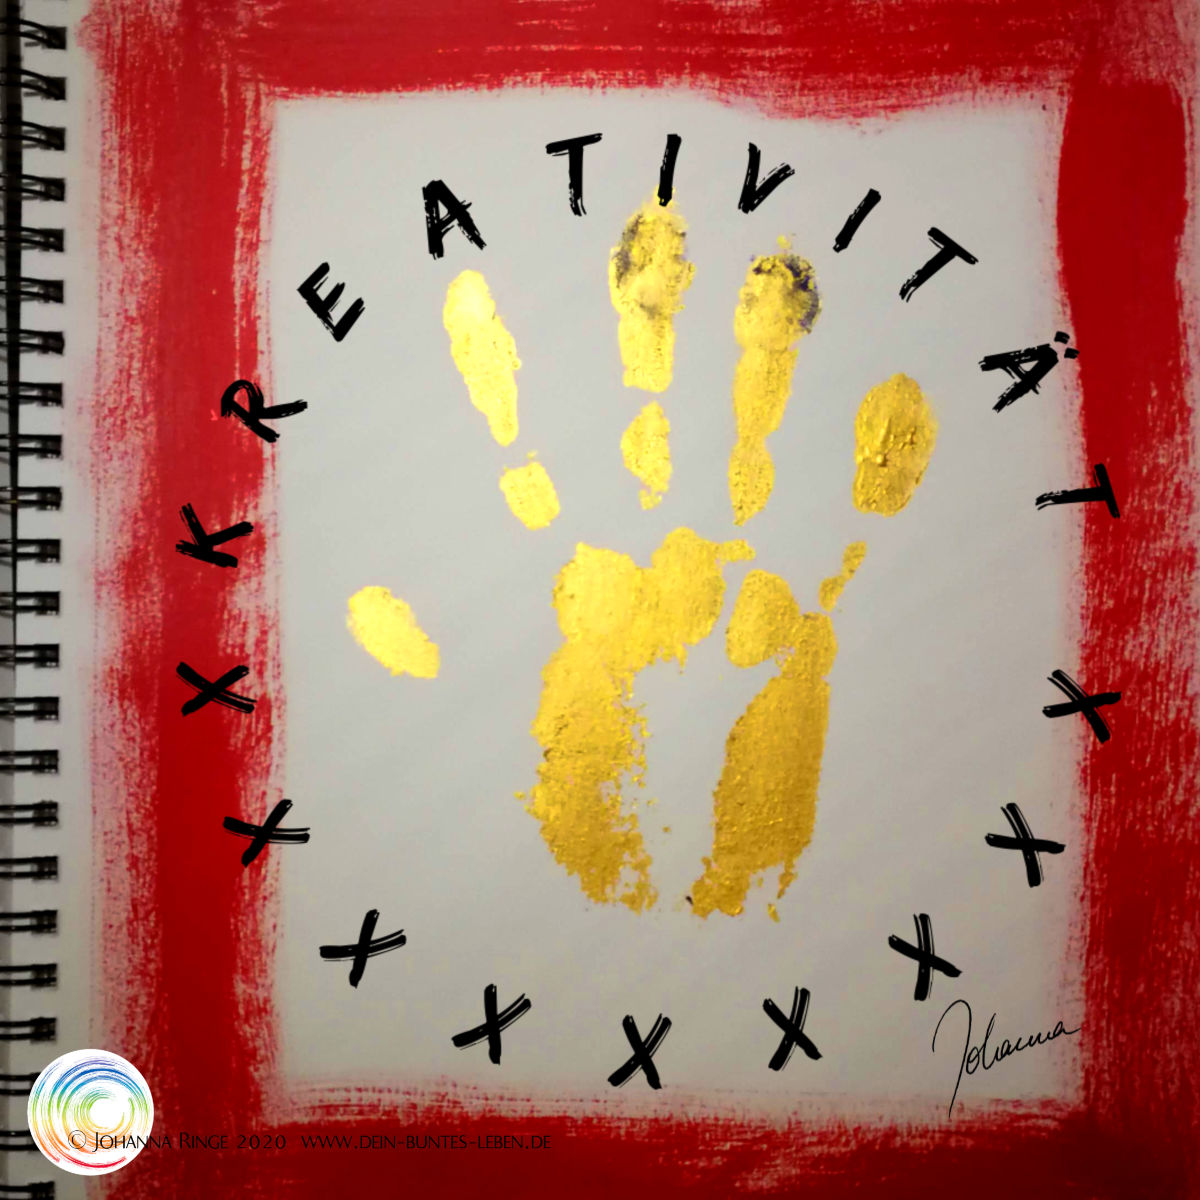 Kreativität hinterlässt Spuren: goldner Handabdruck in rotem Rahmen. ©Johanna Ringe 2020 www.dein-buntes-leben.de